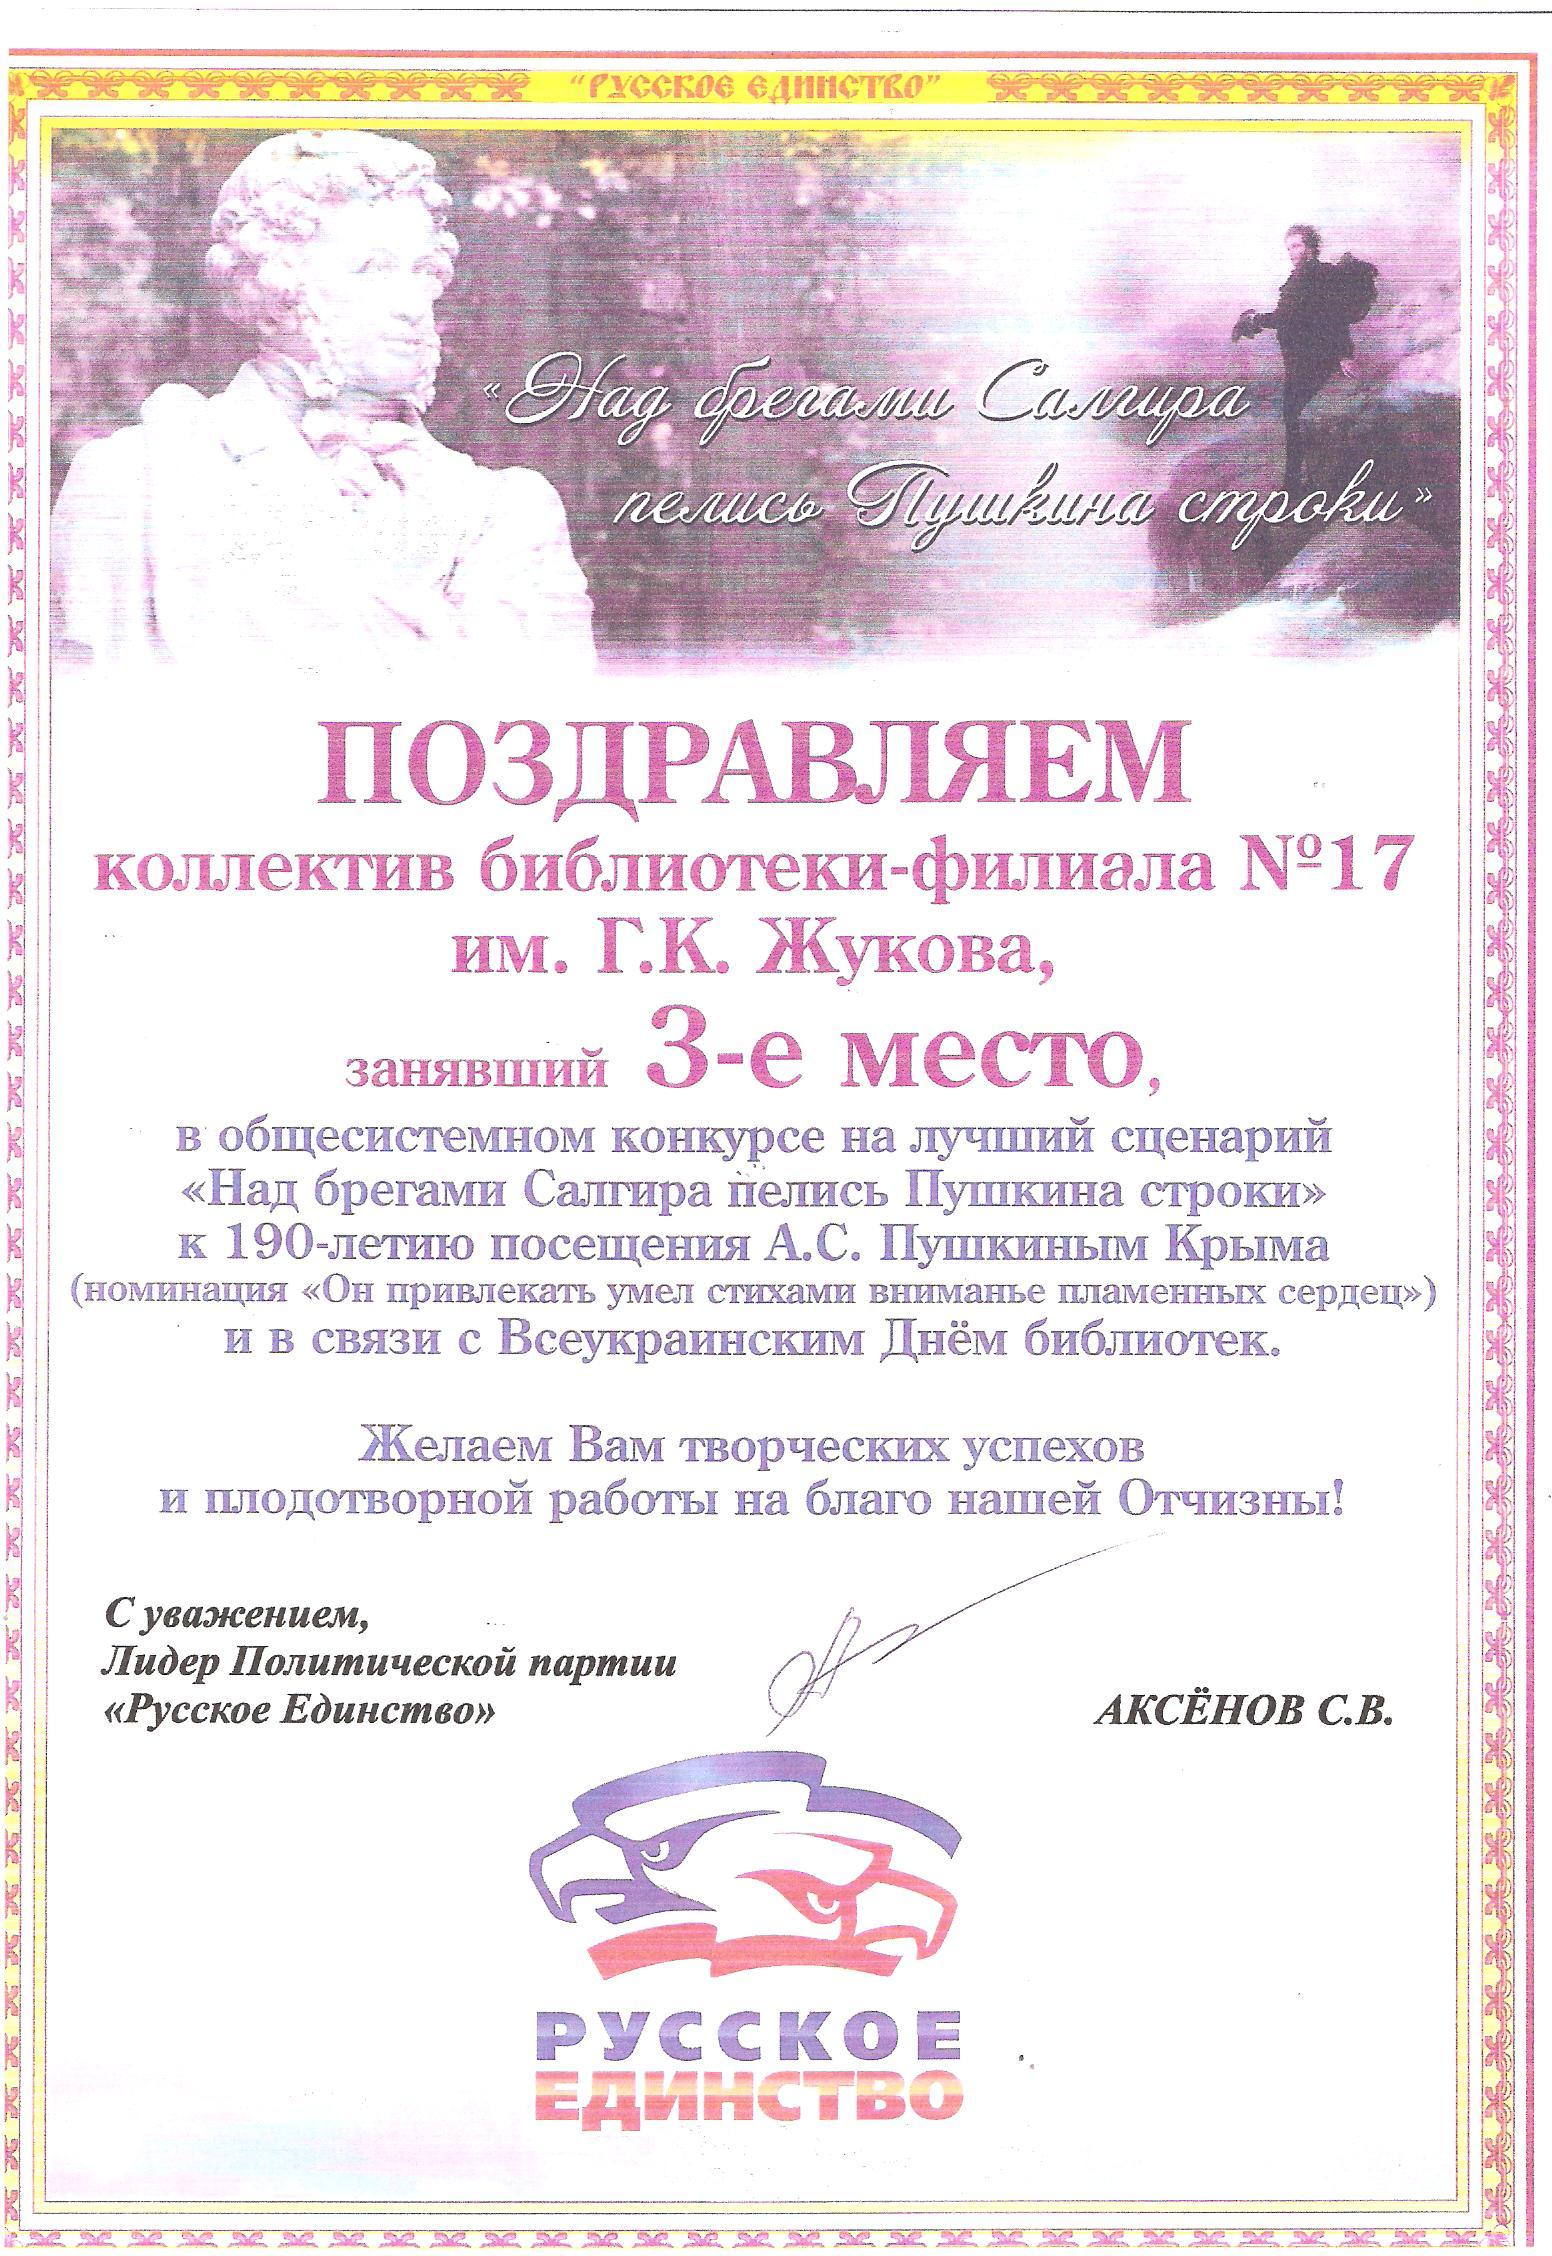 грамота,пушкин,2010 год,библиотека-филиал17,жуков